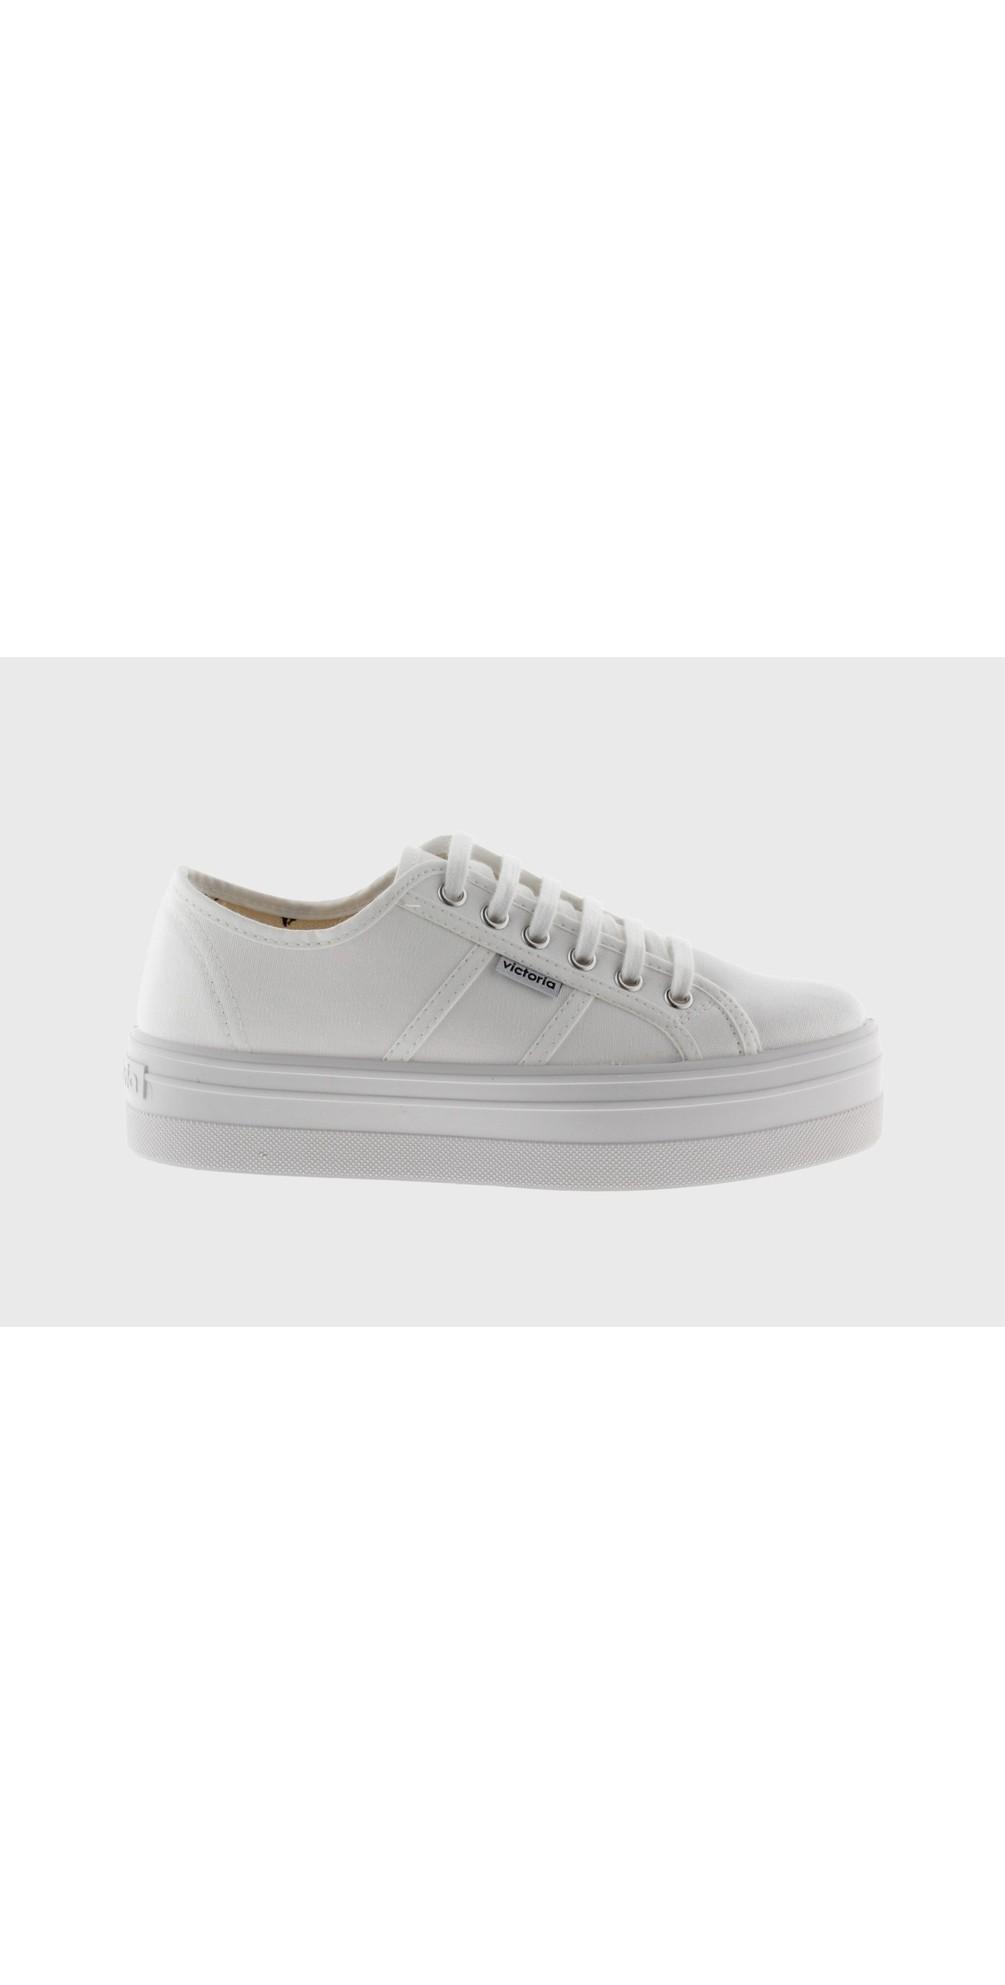 Barcelona Flatform Cotton Canvas Washable Sneaker main image